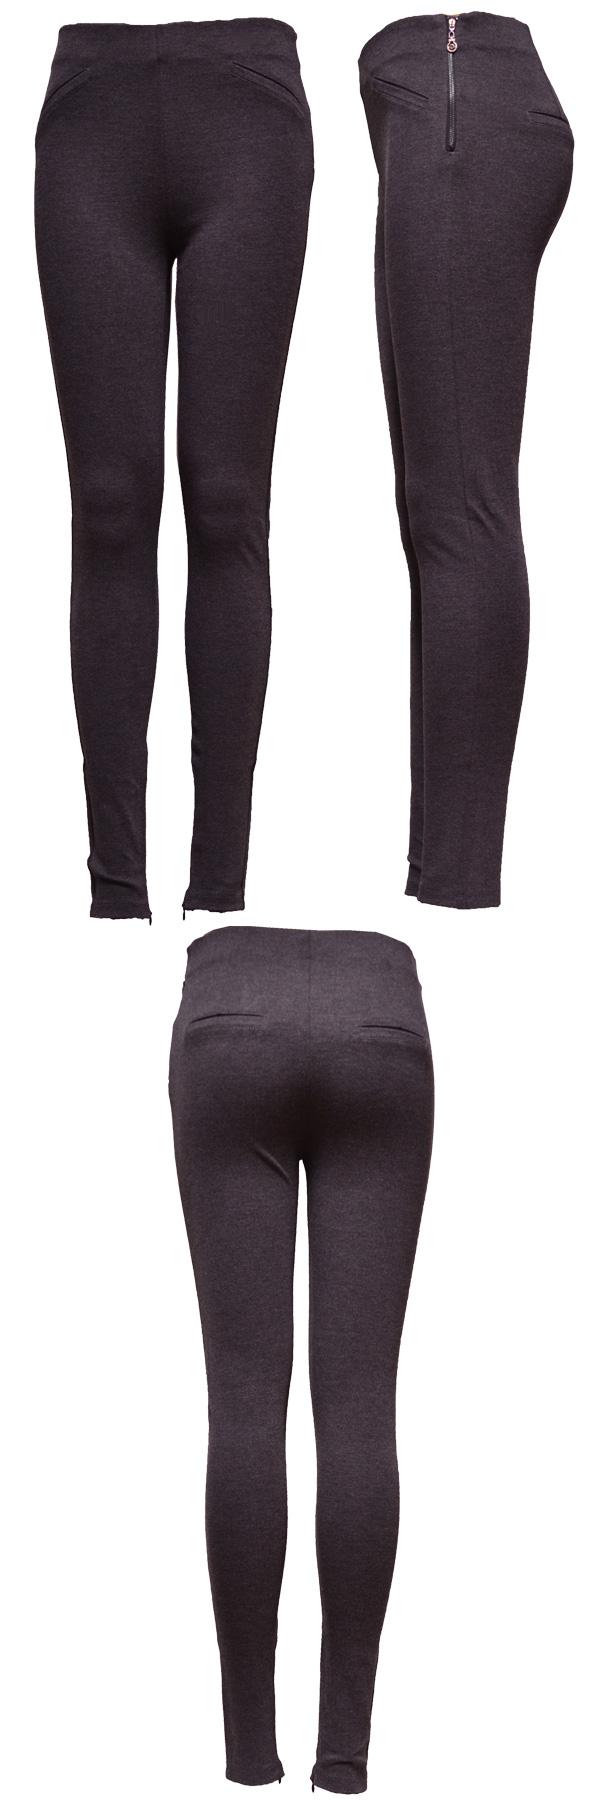 Medium Grey Lady Leggings with Zipper Open